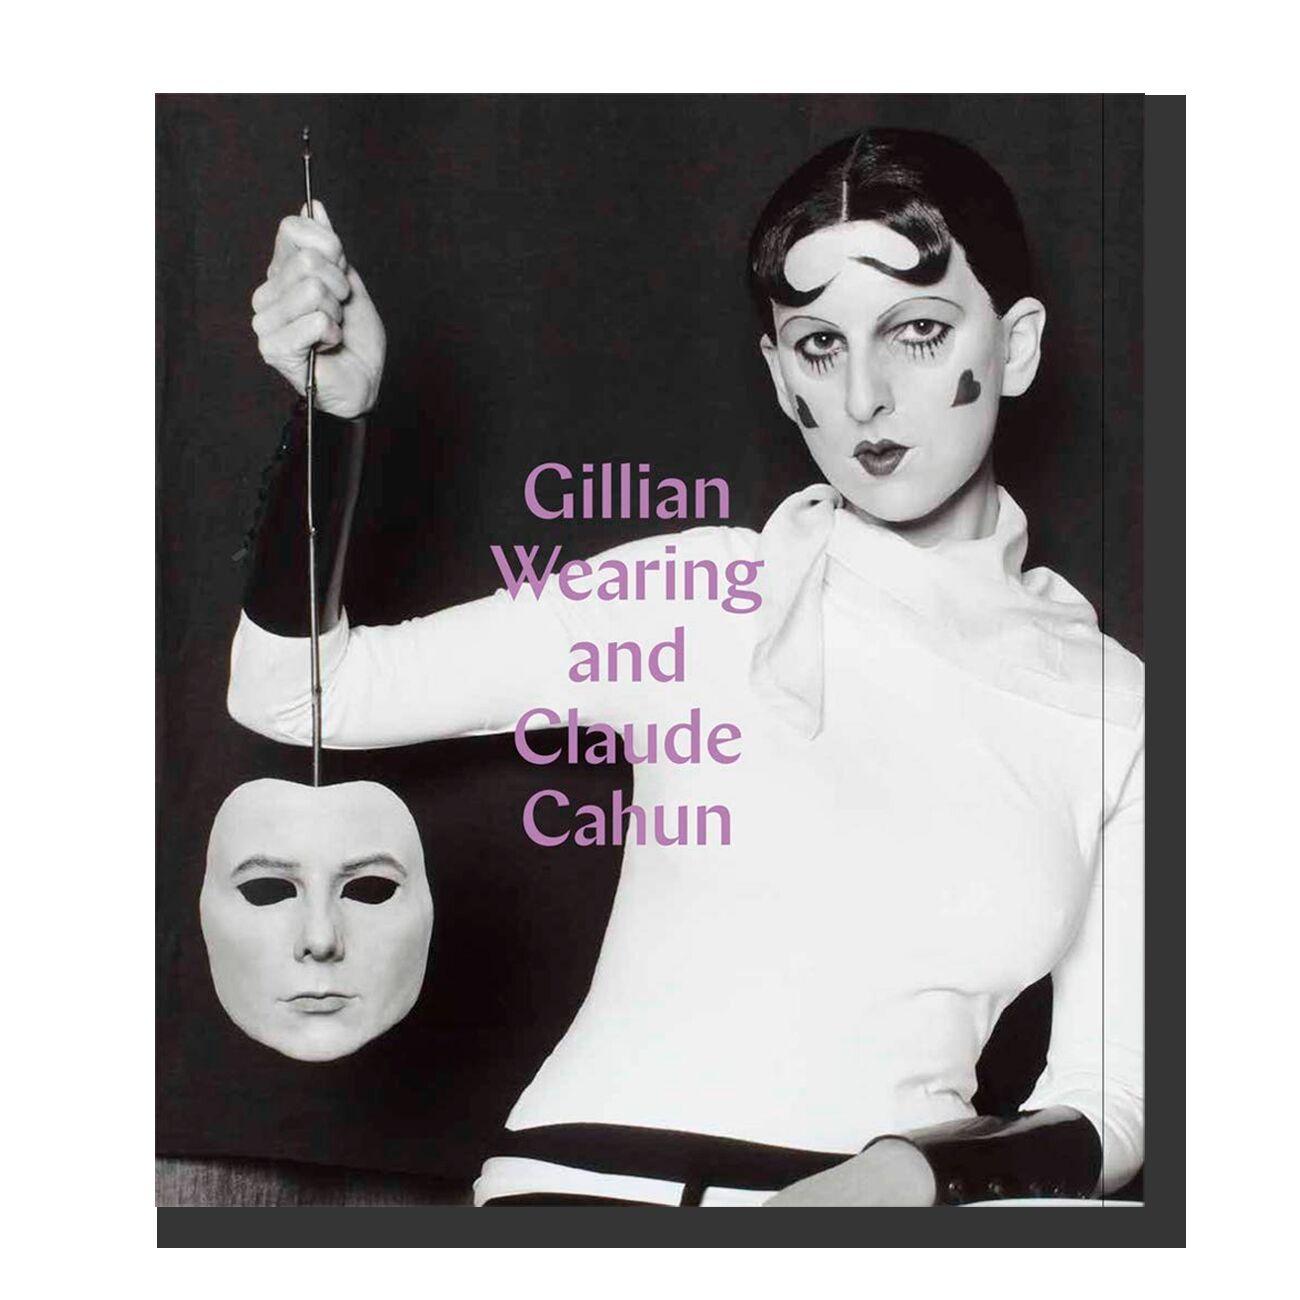 Gillian Wearing and Claude Cahun